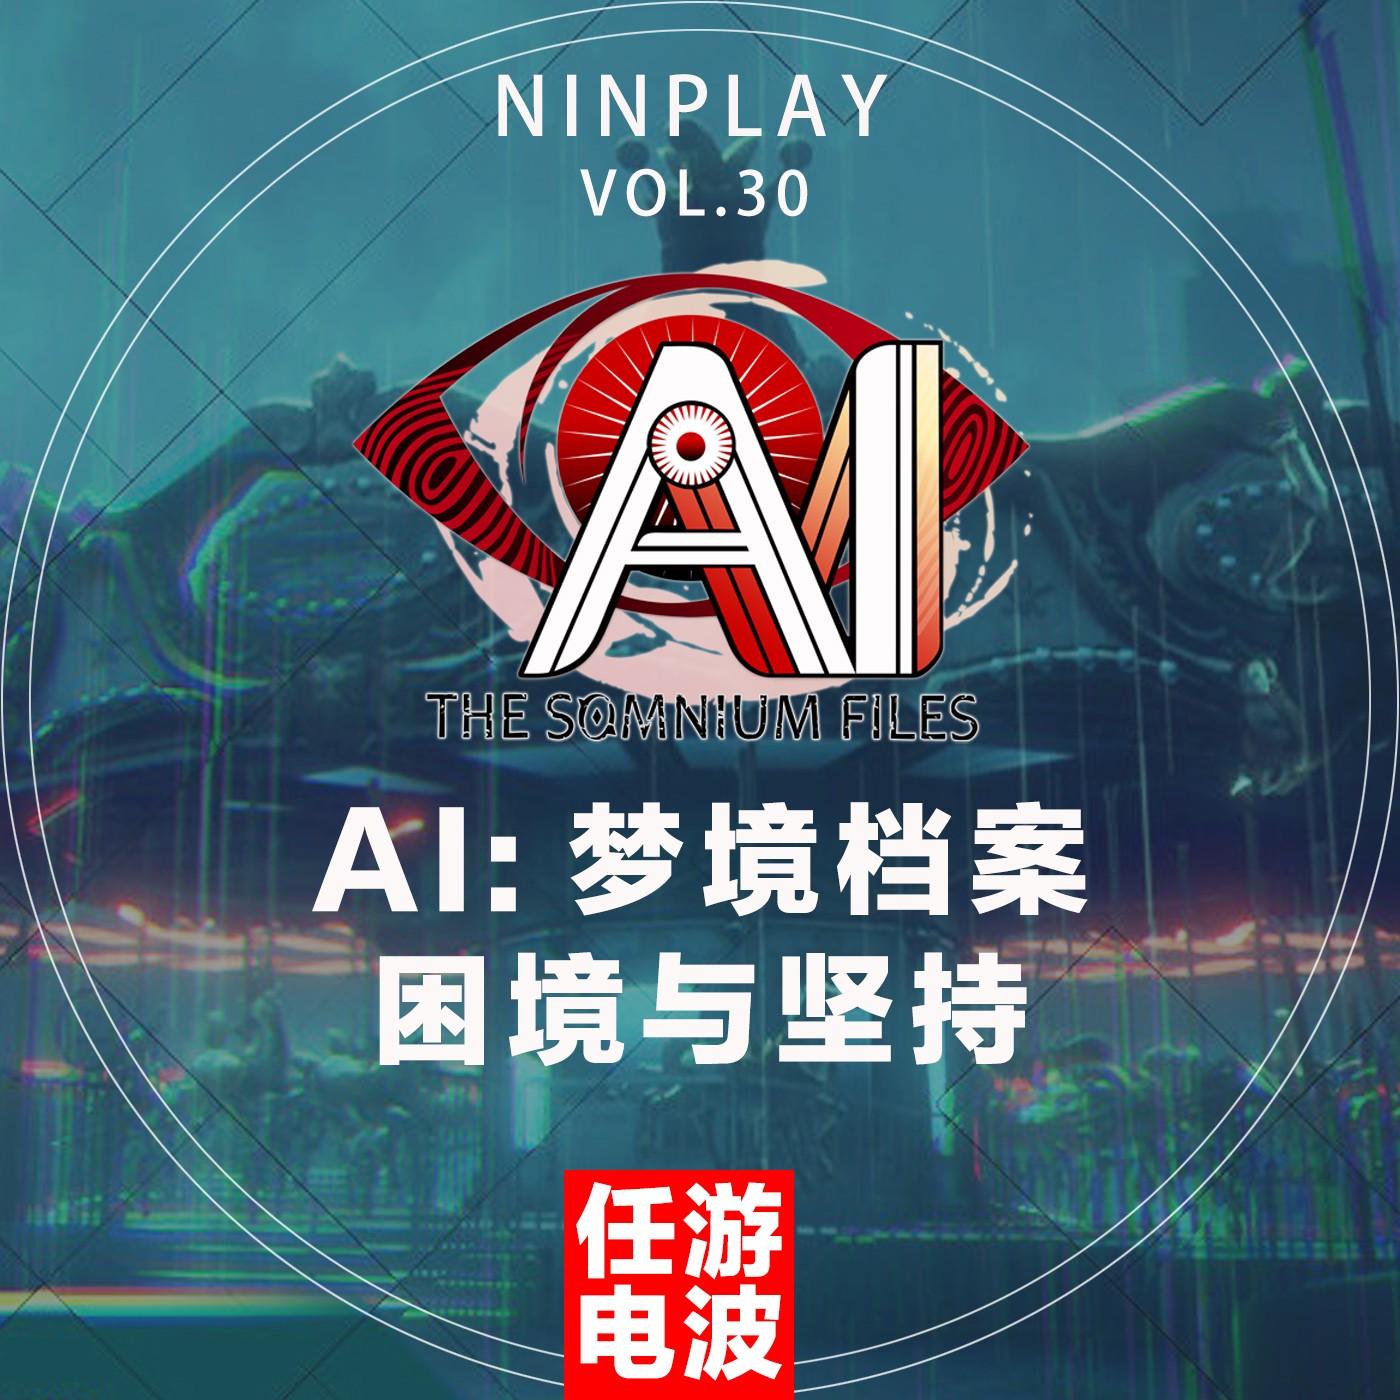 AI:梦境档案 困境与坚持|Vol.30